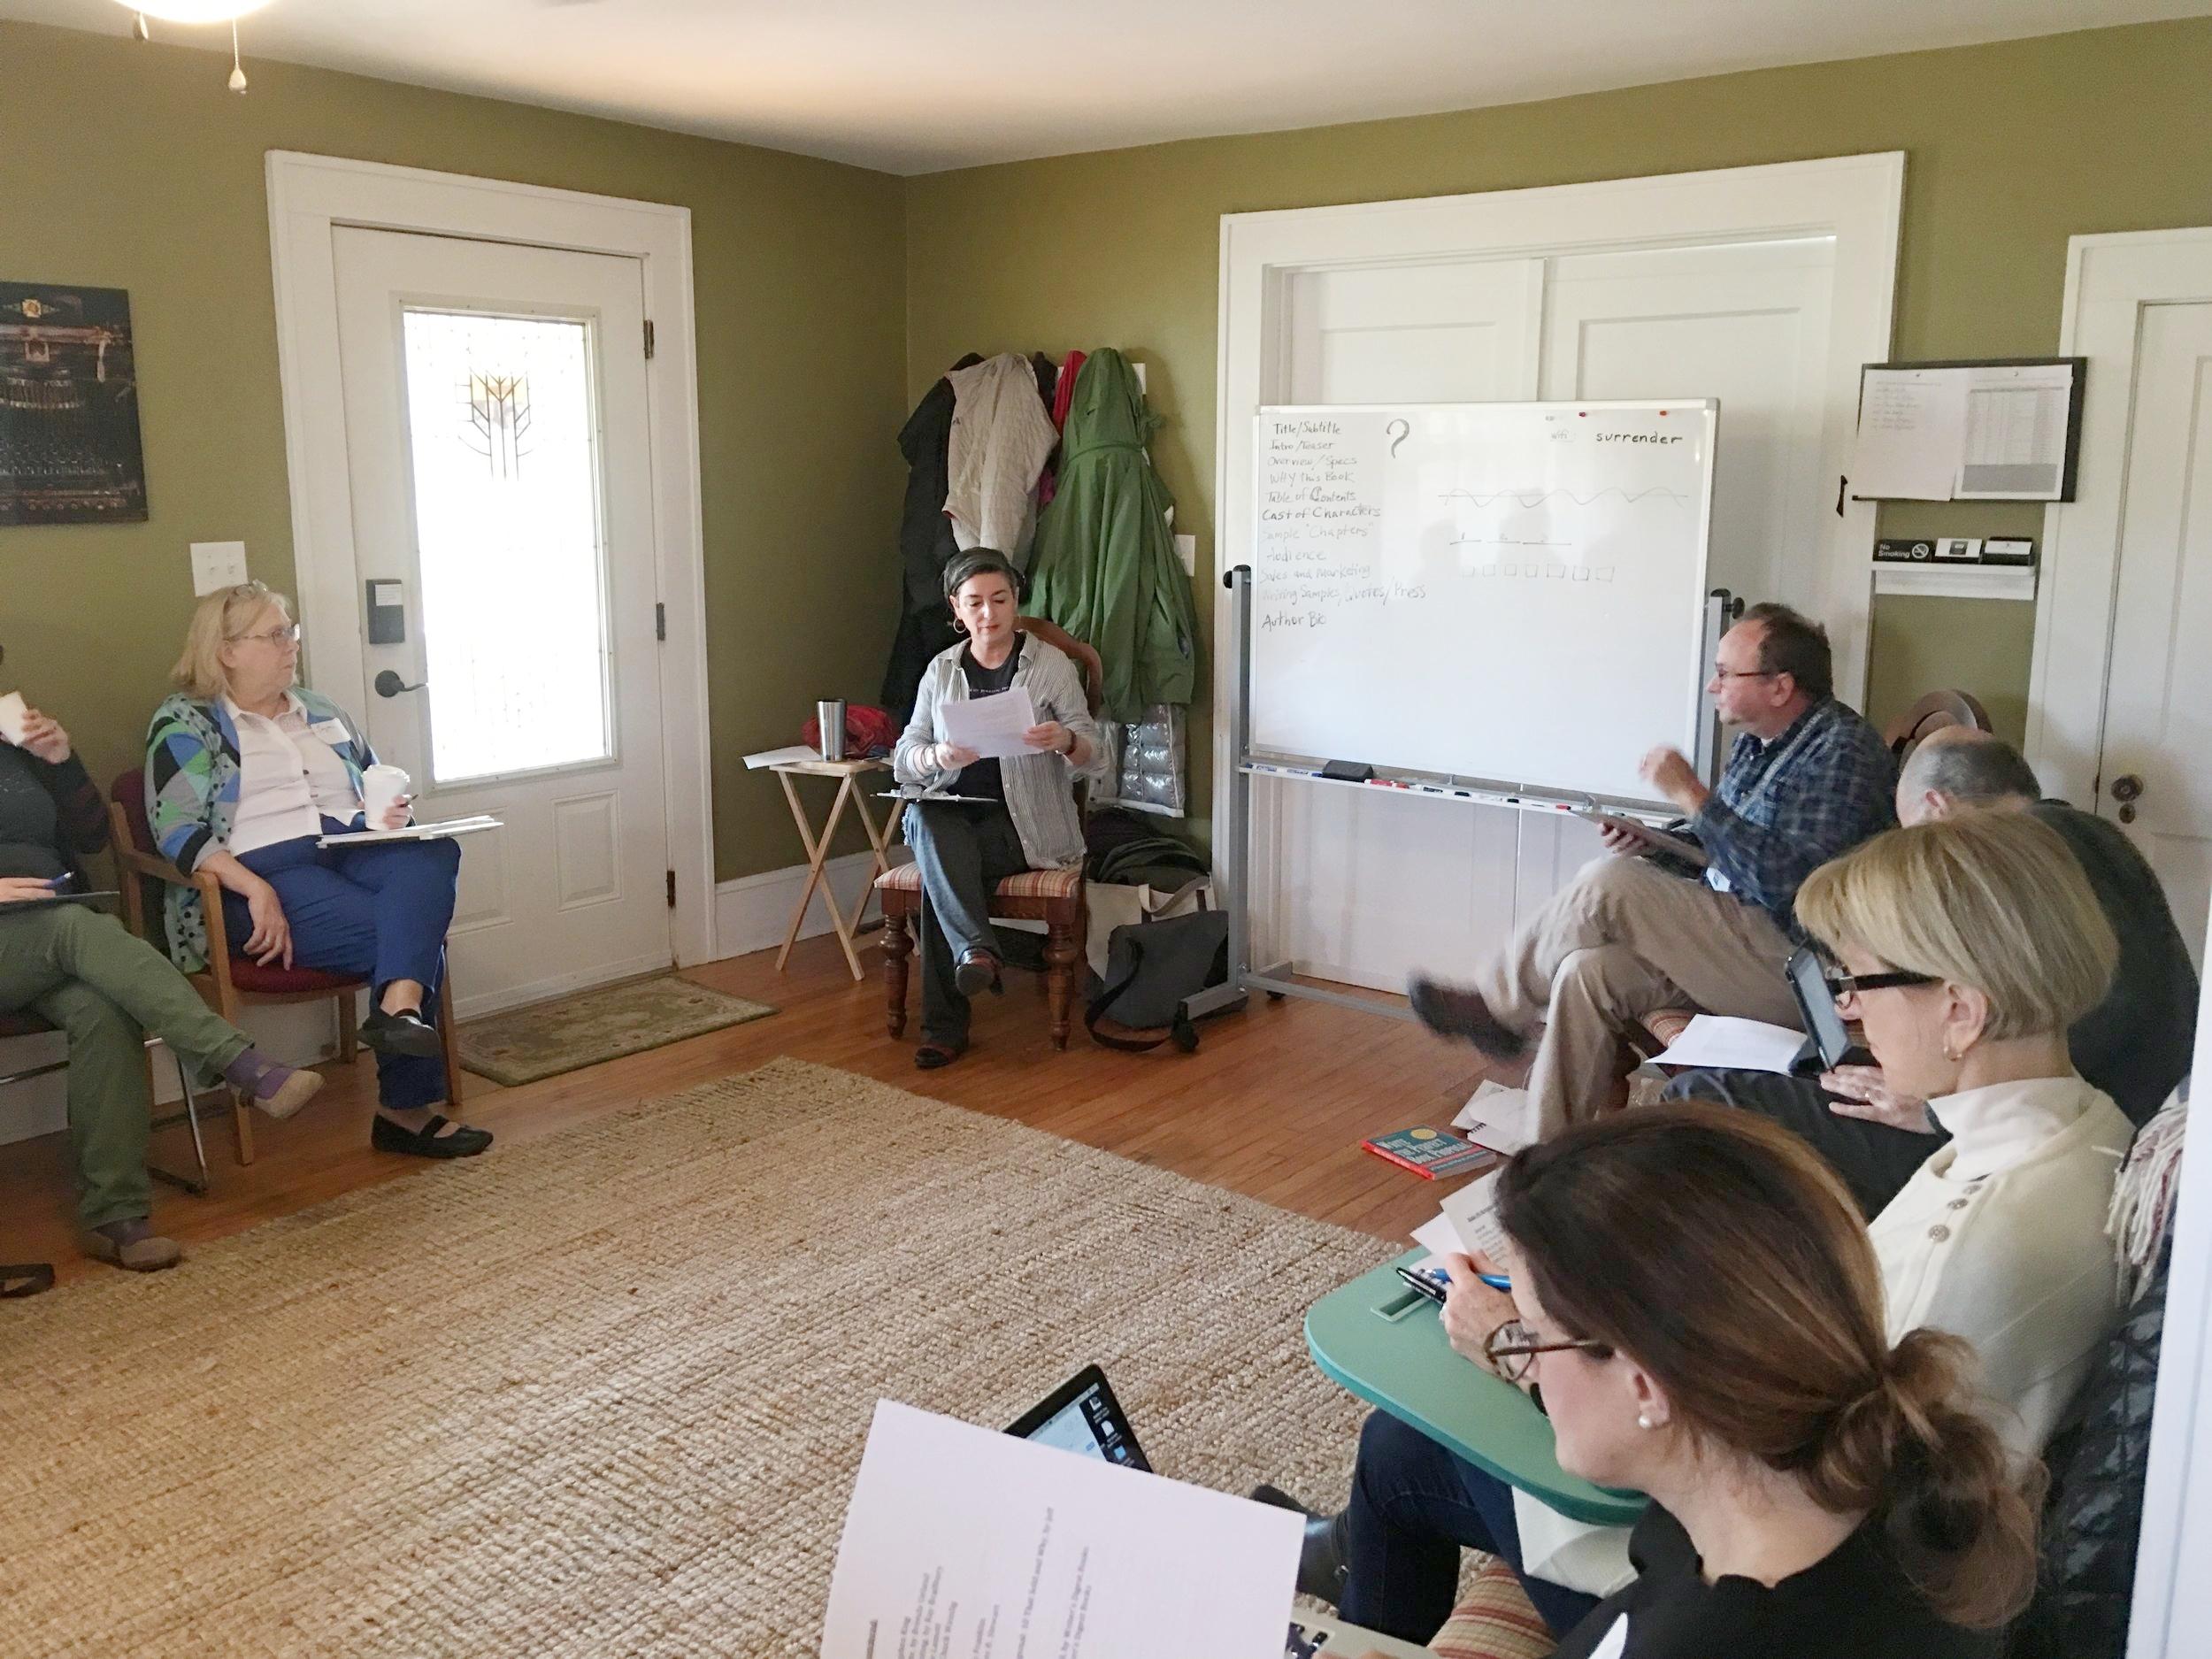 Denise Kiernan & Joe D'Agnese dispensing wisdom at the Nonfiction Book Proposal Bootcamp